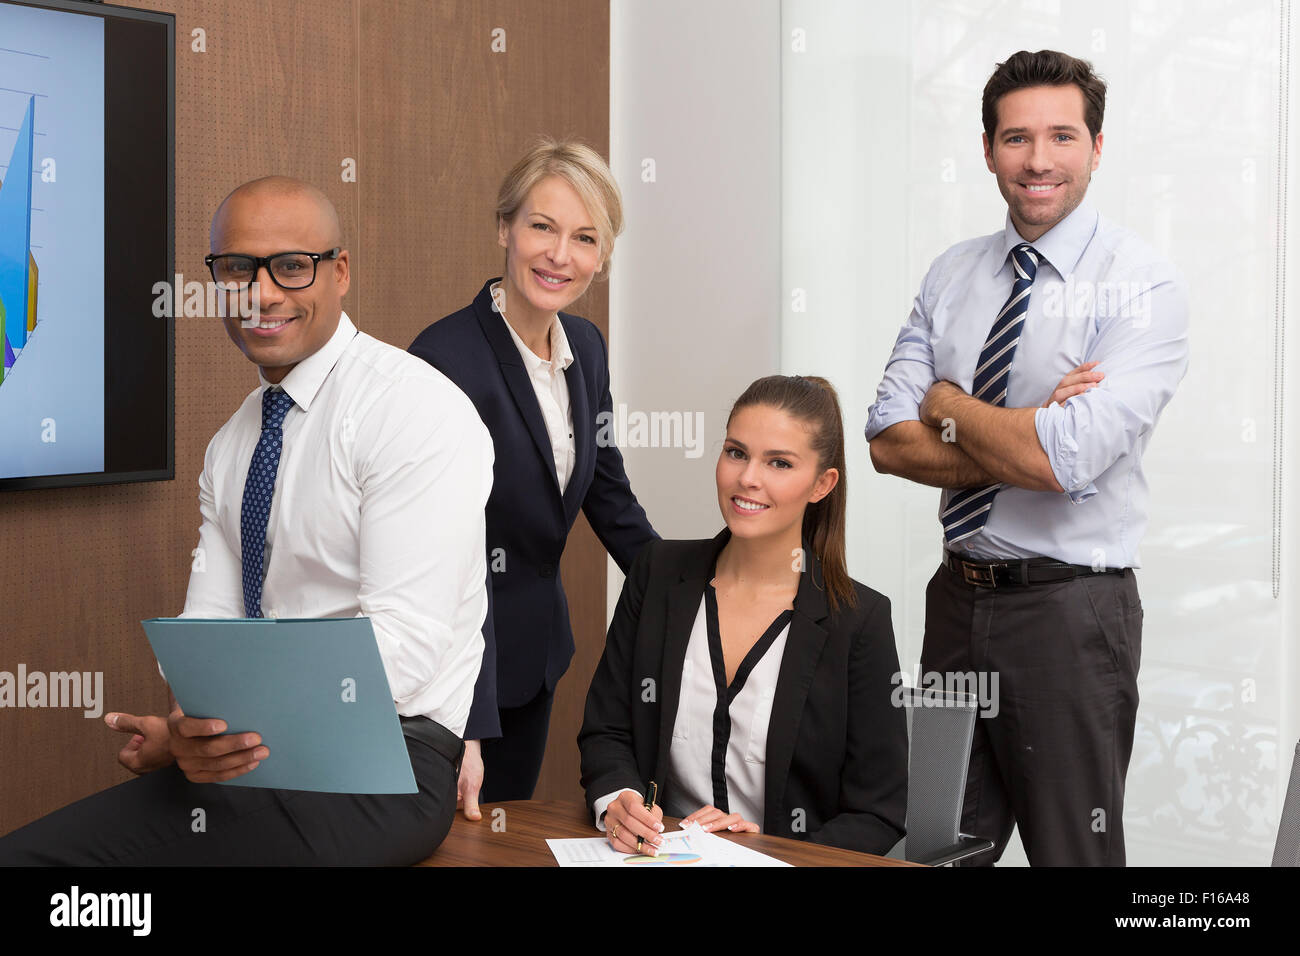 Retrato de un grupo de personas de negocios Imagen De Stock